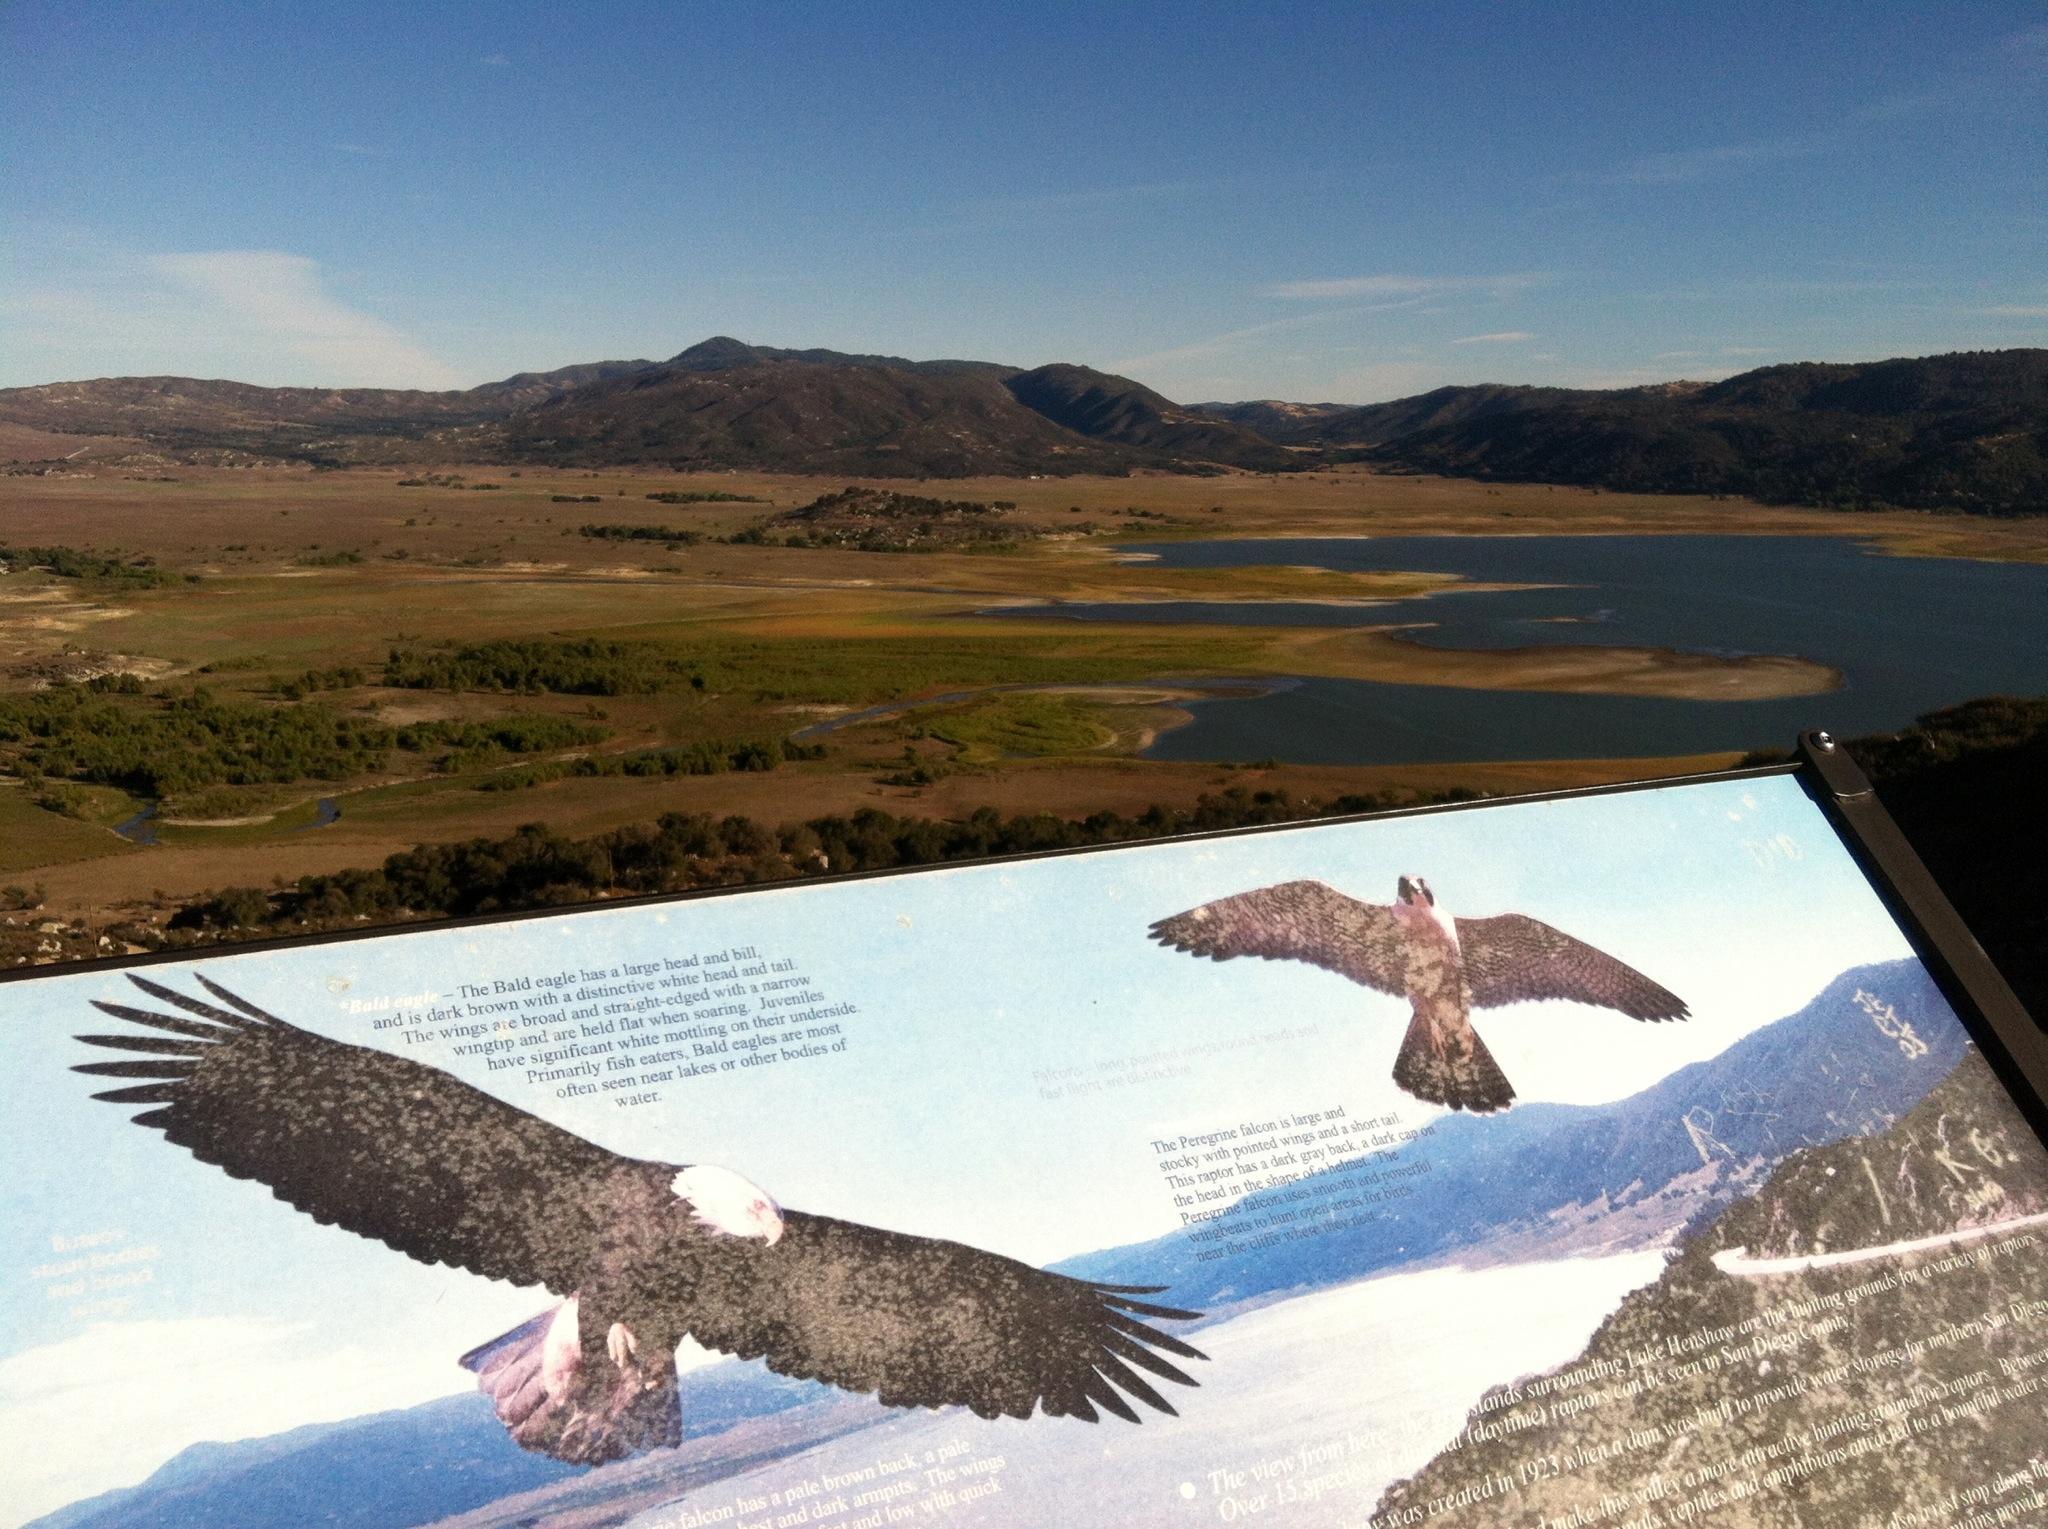 Lake Henshaw Vista Point San Diego Travel Blog